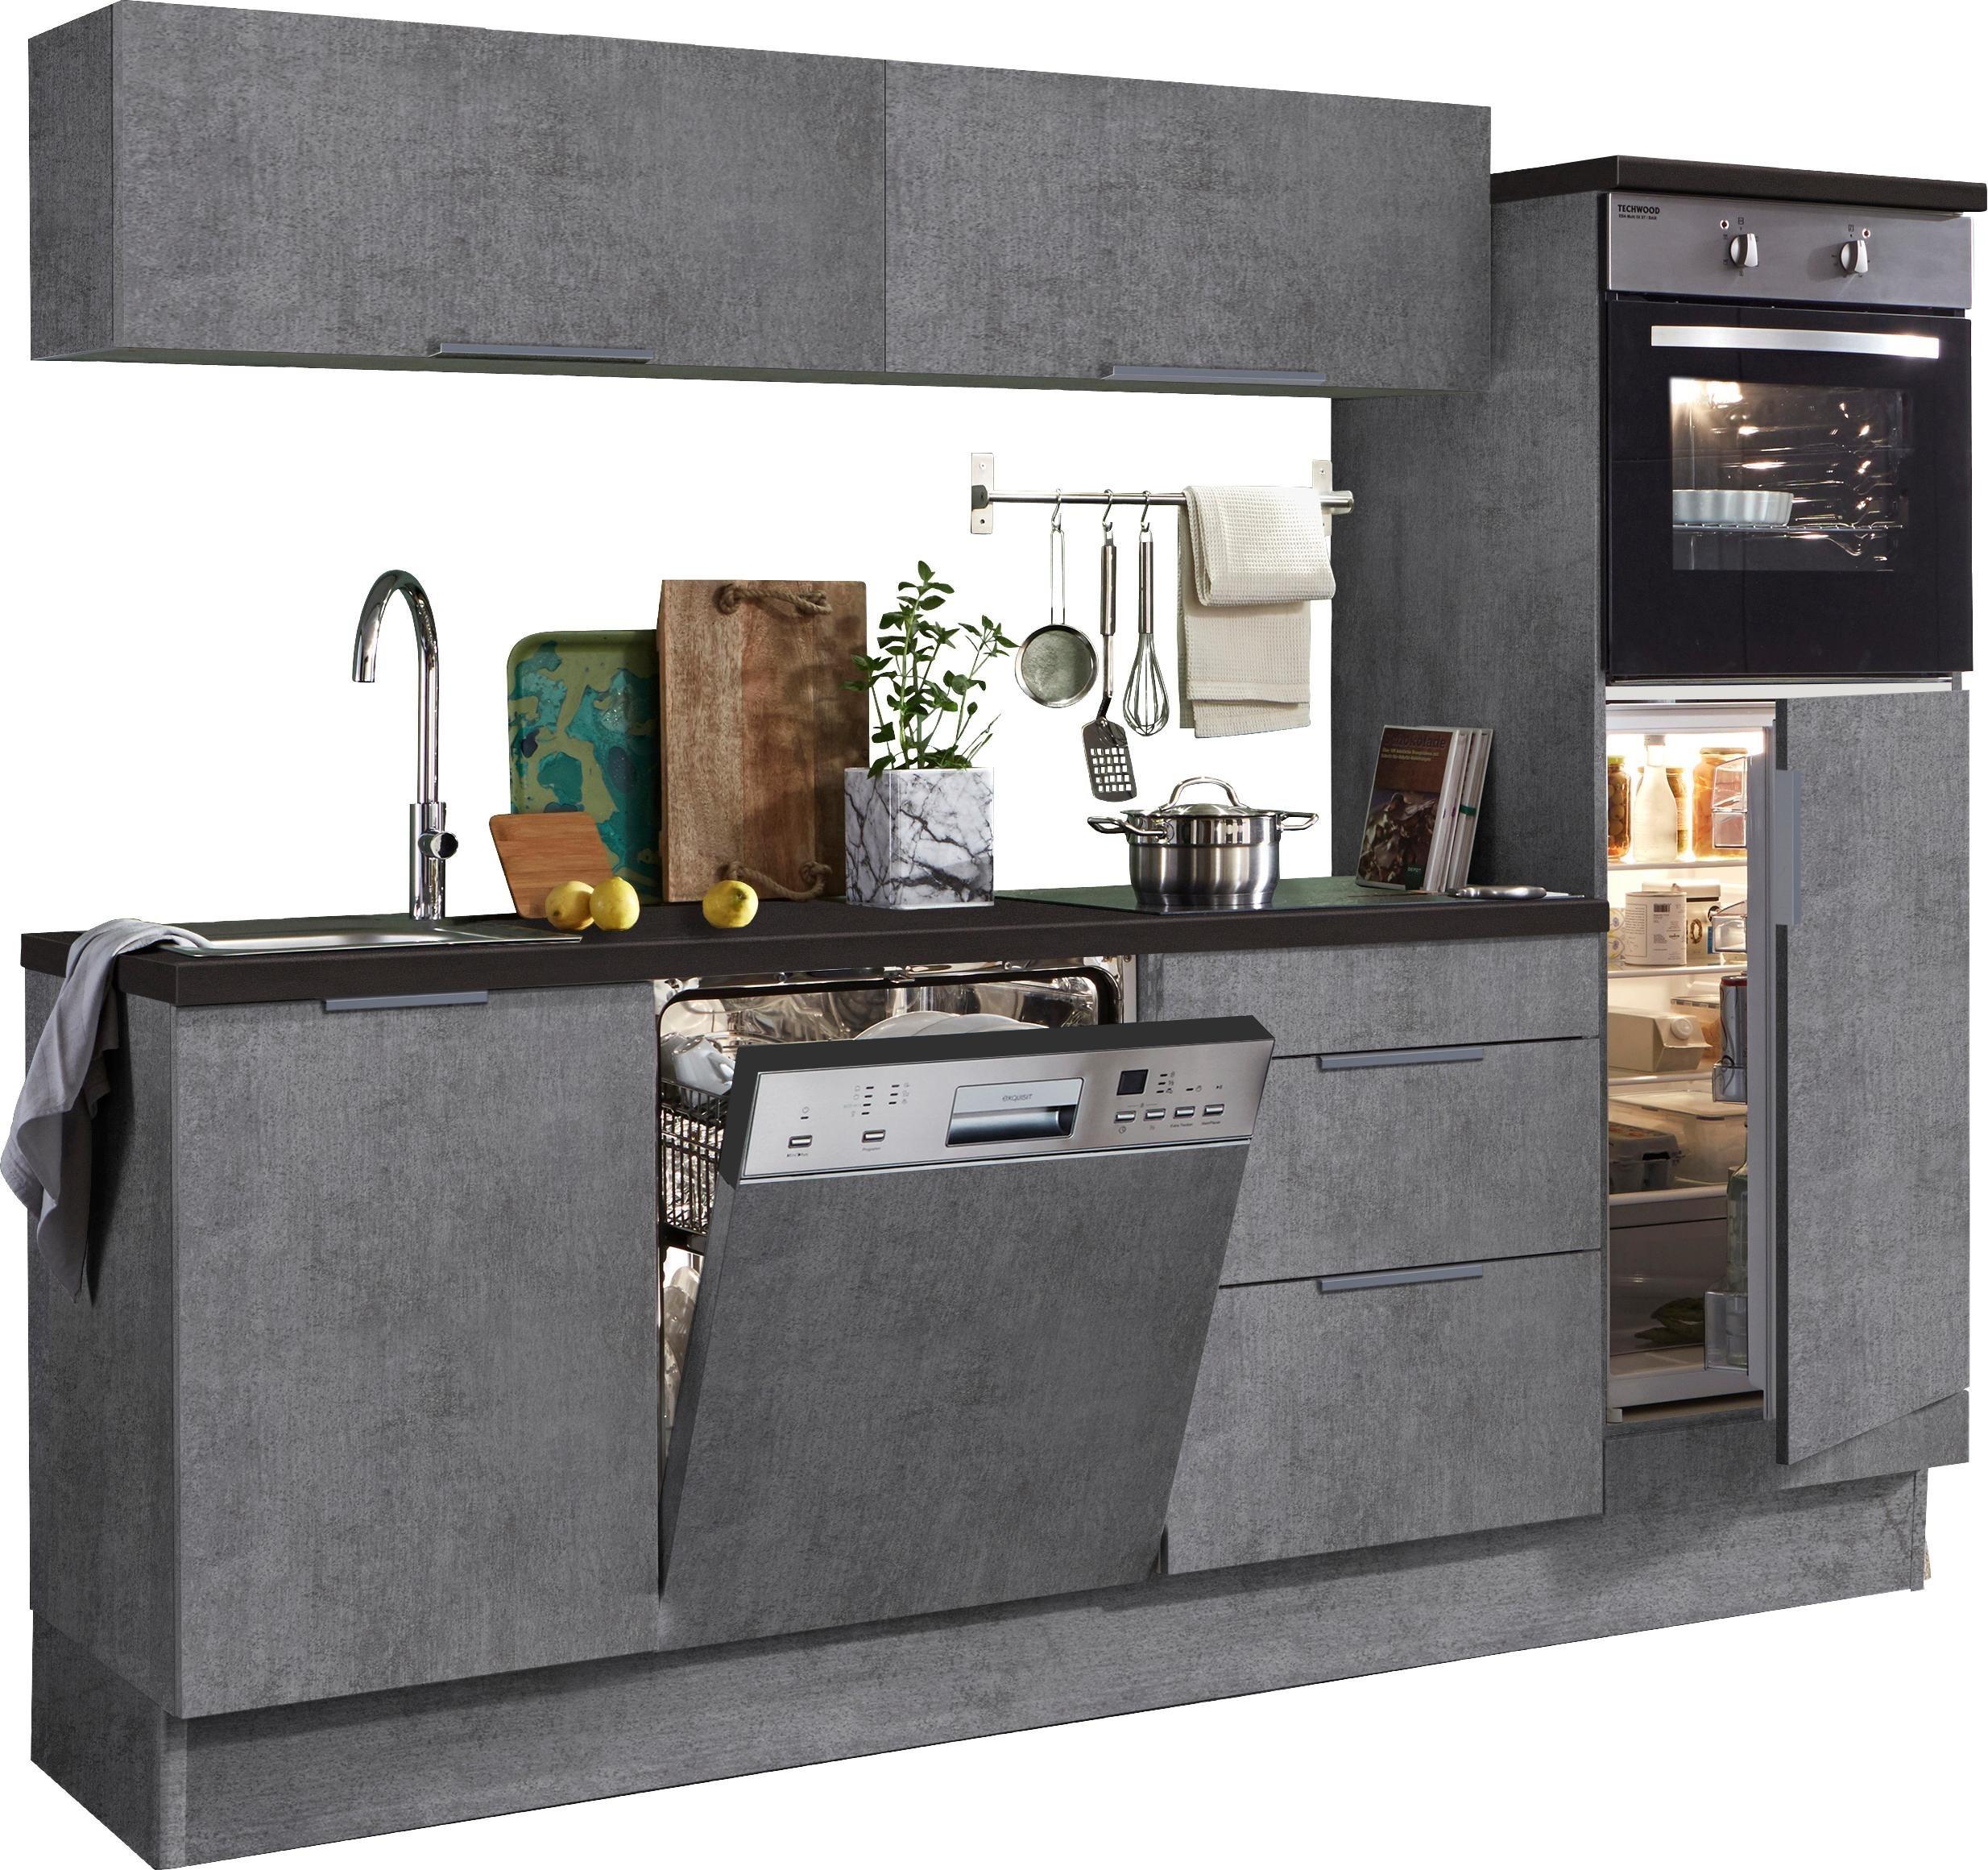 Ikea kuche ohne e gerate for Einbaukuchen ohne gerate